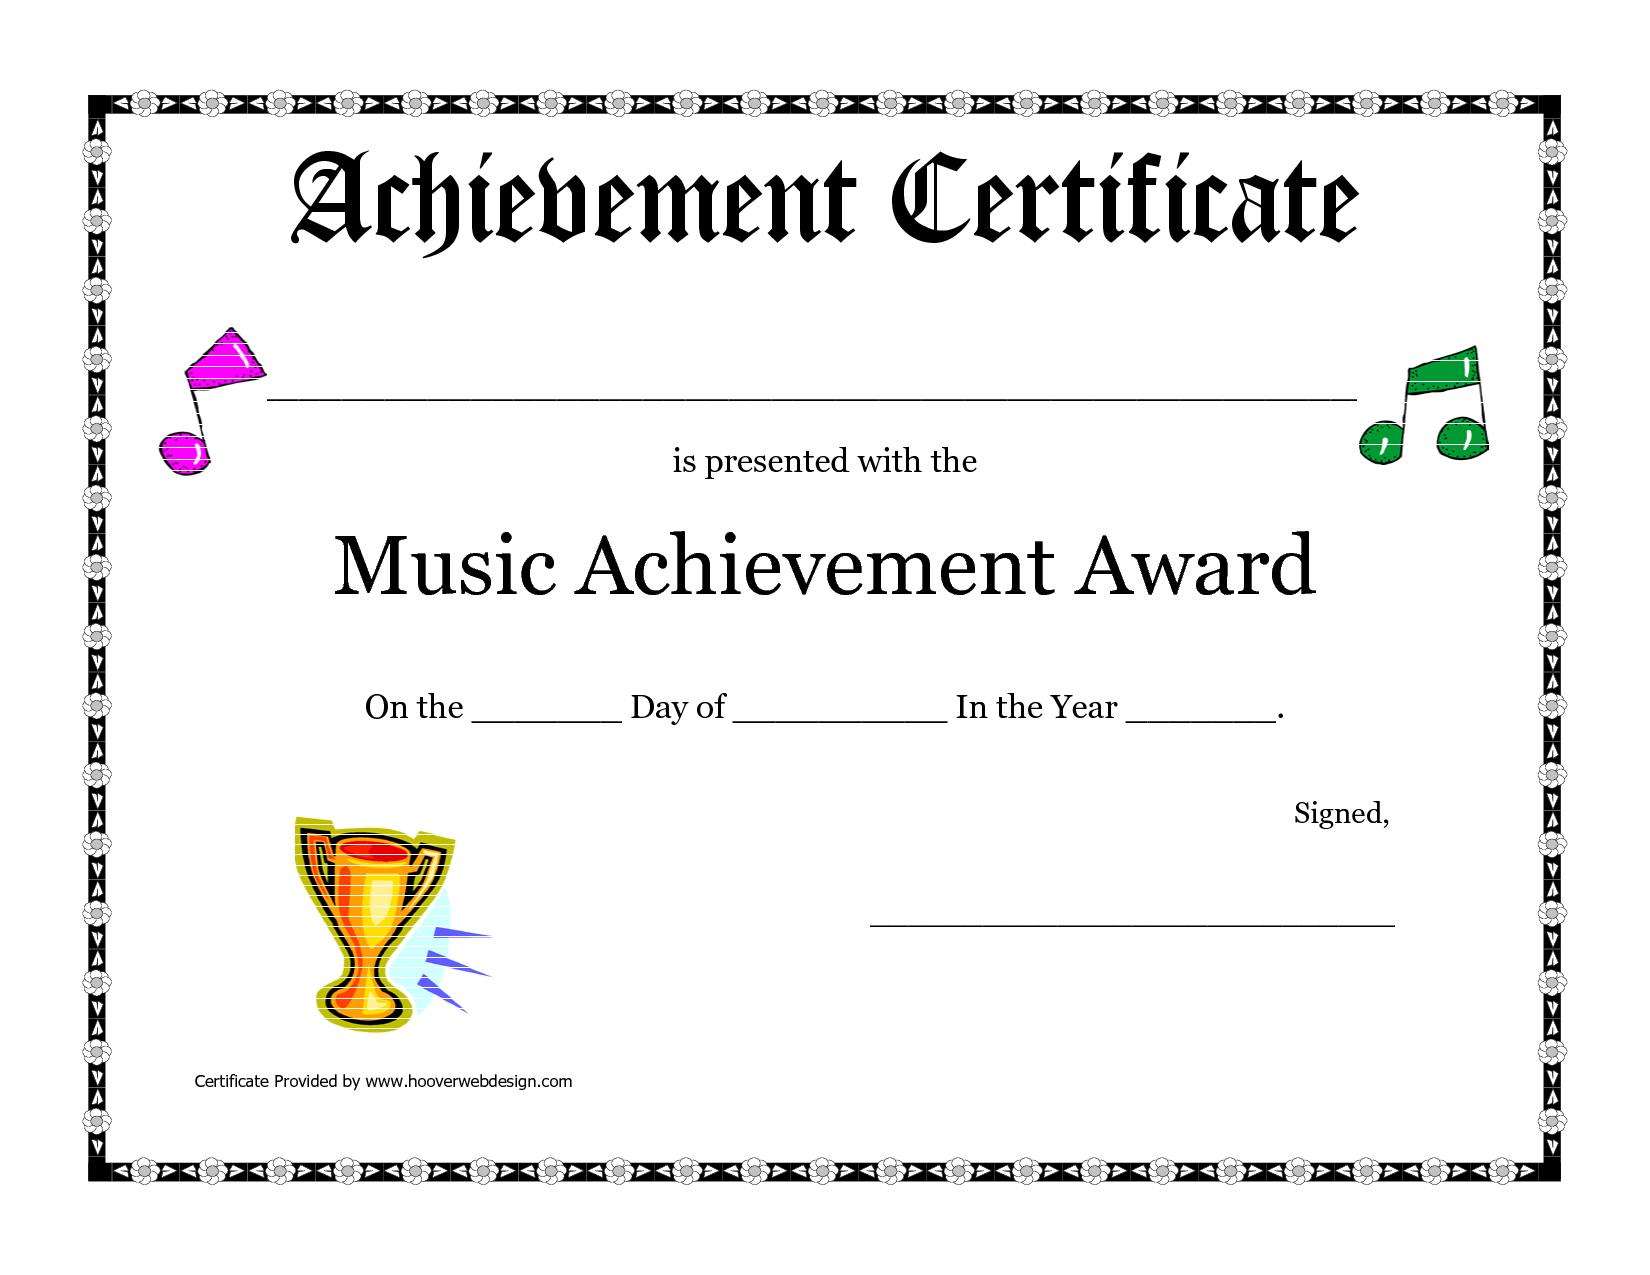 Free Printable Achievement Award Certificate Template within Choir Certificate Template